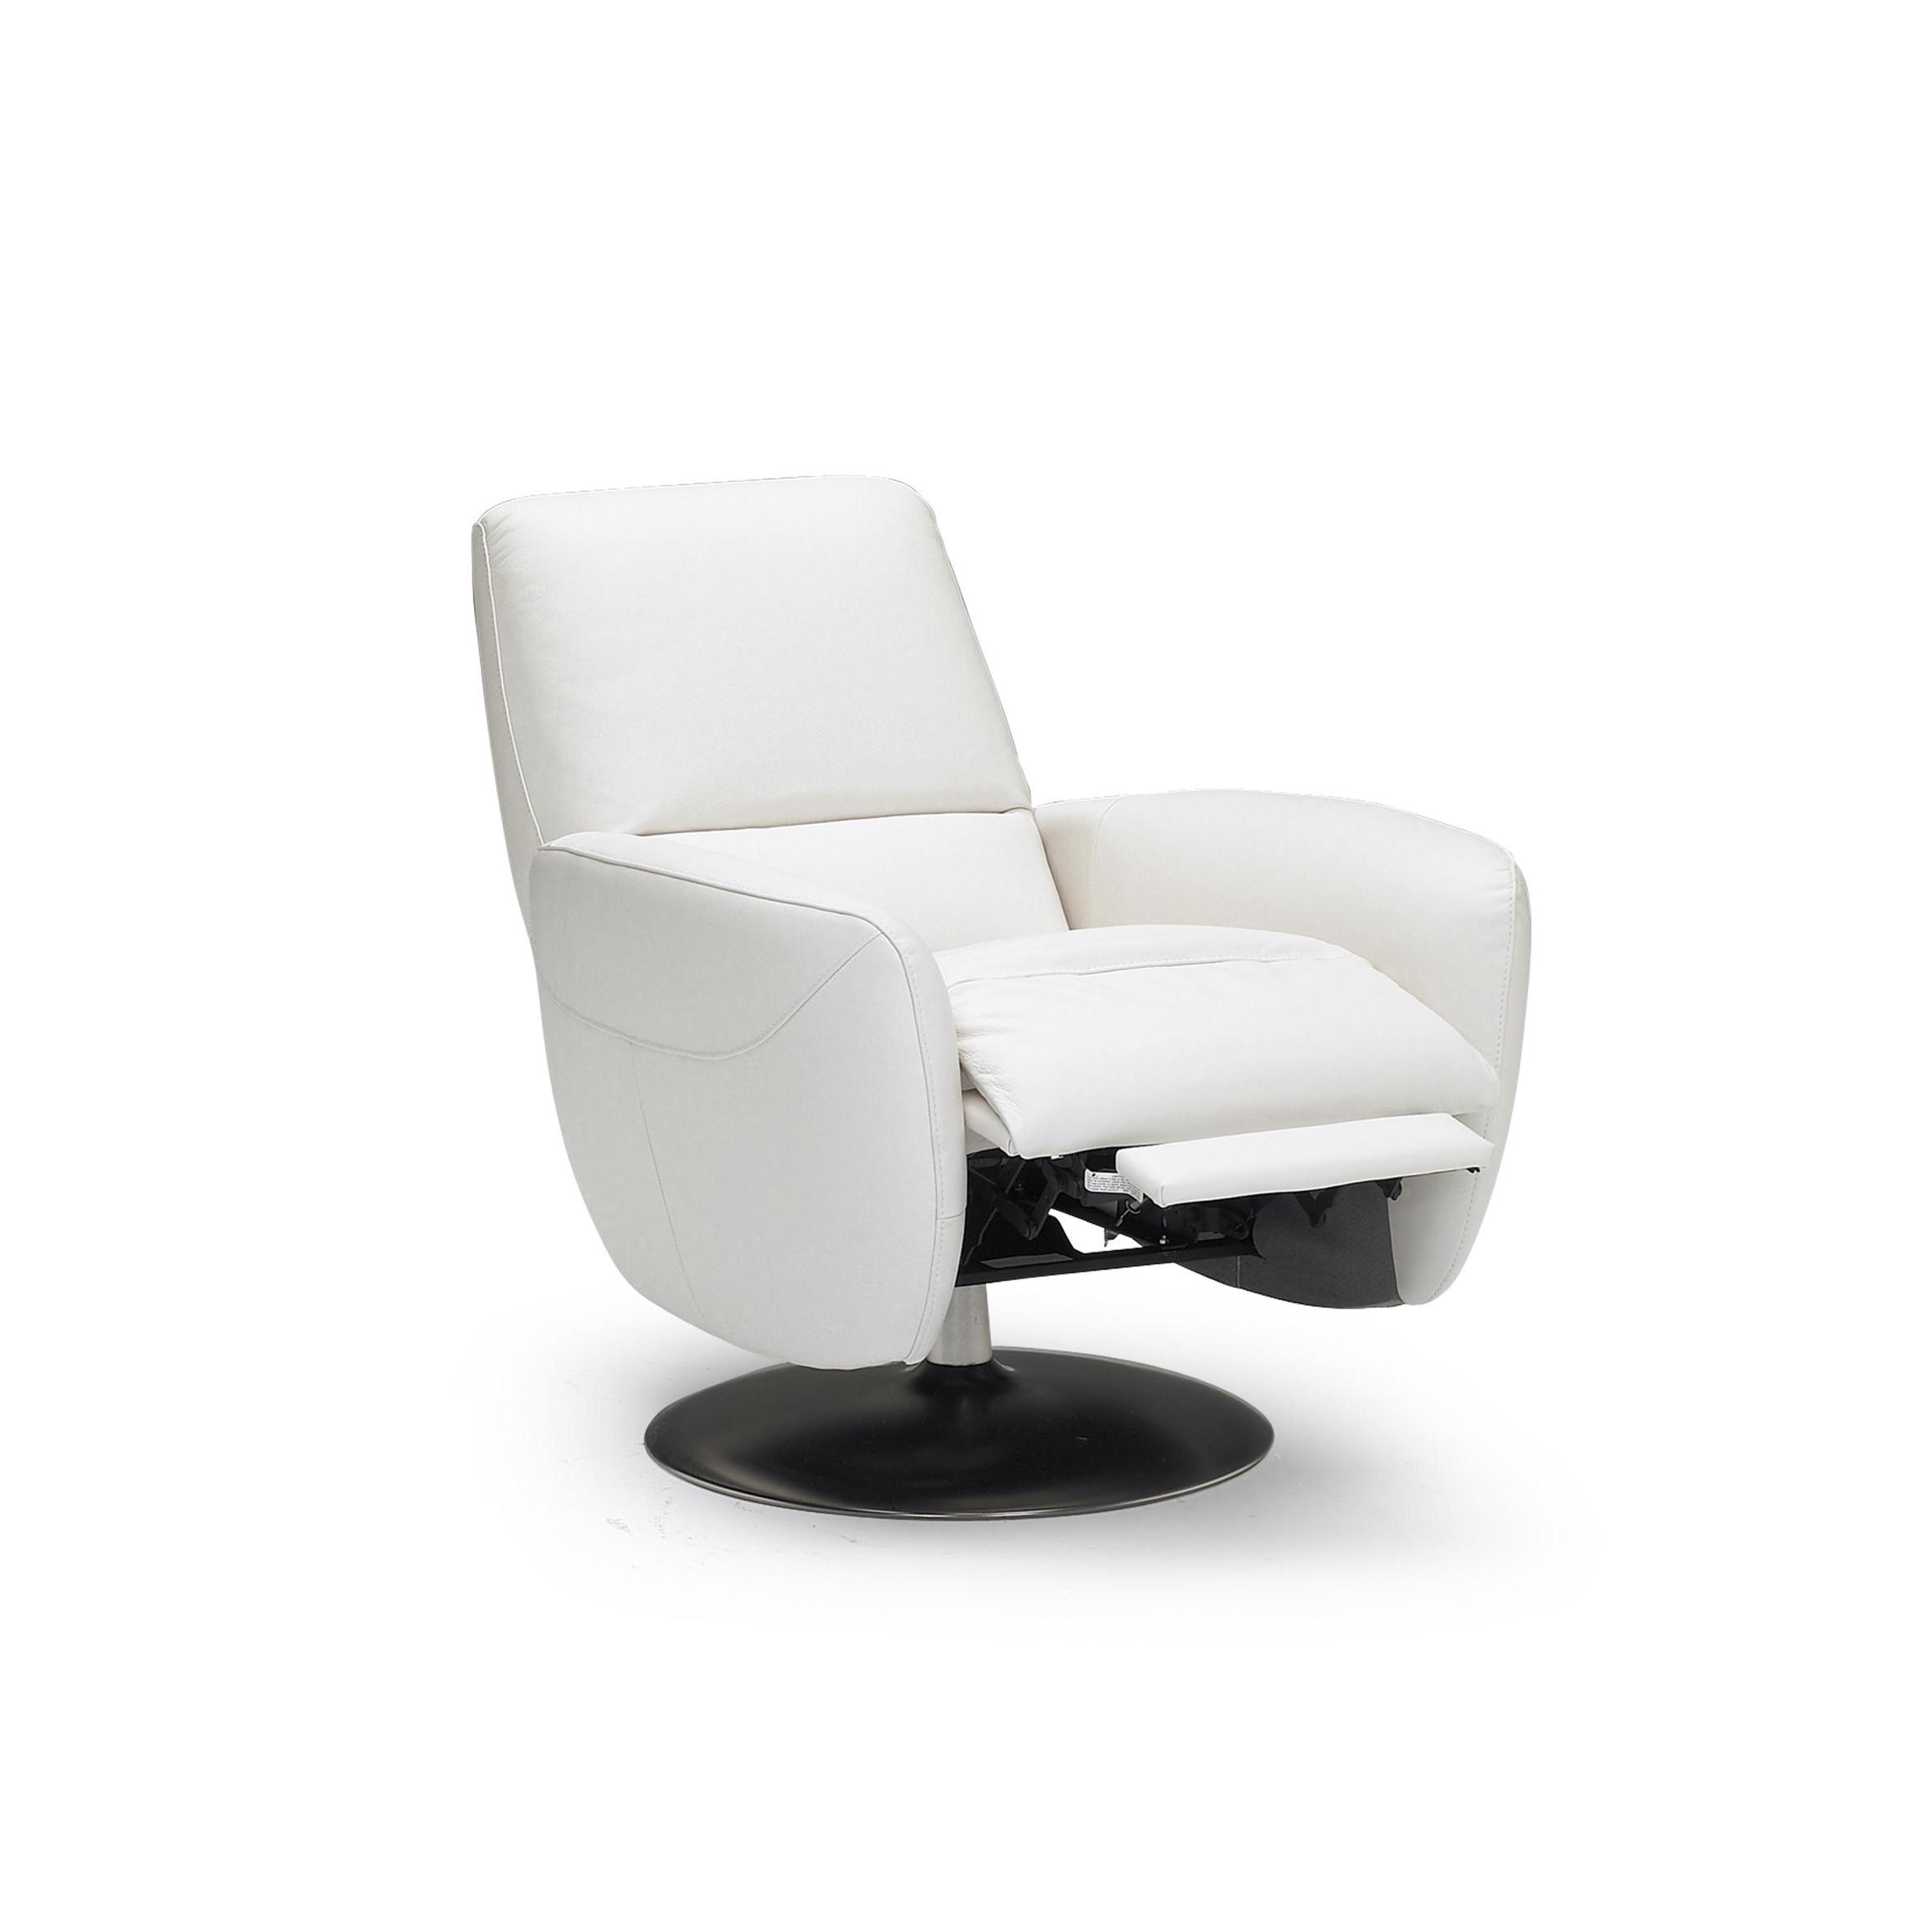 natuzzi swivel chair antique dining chairs uk italia genny reclining